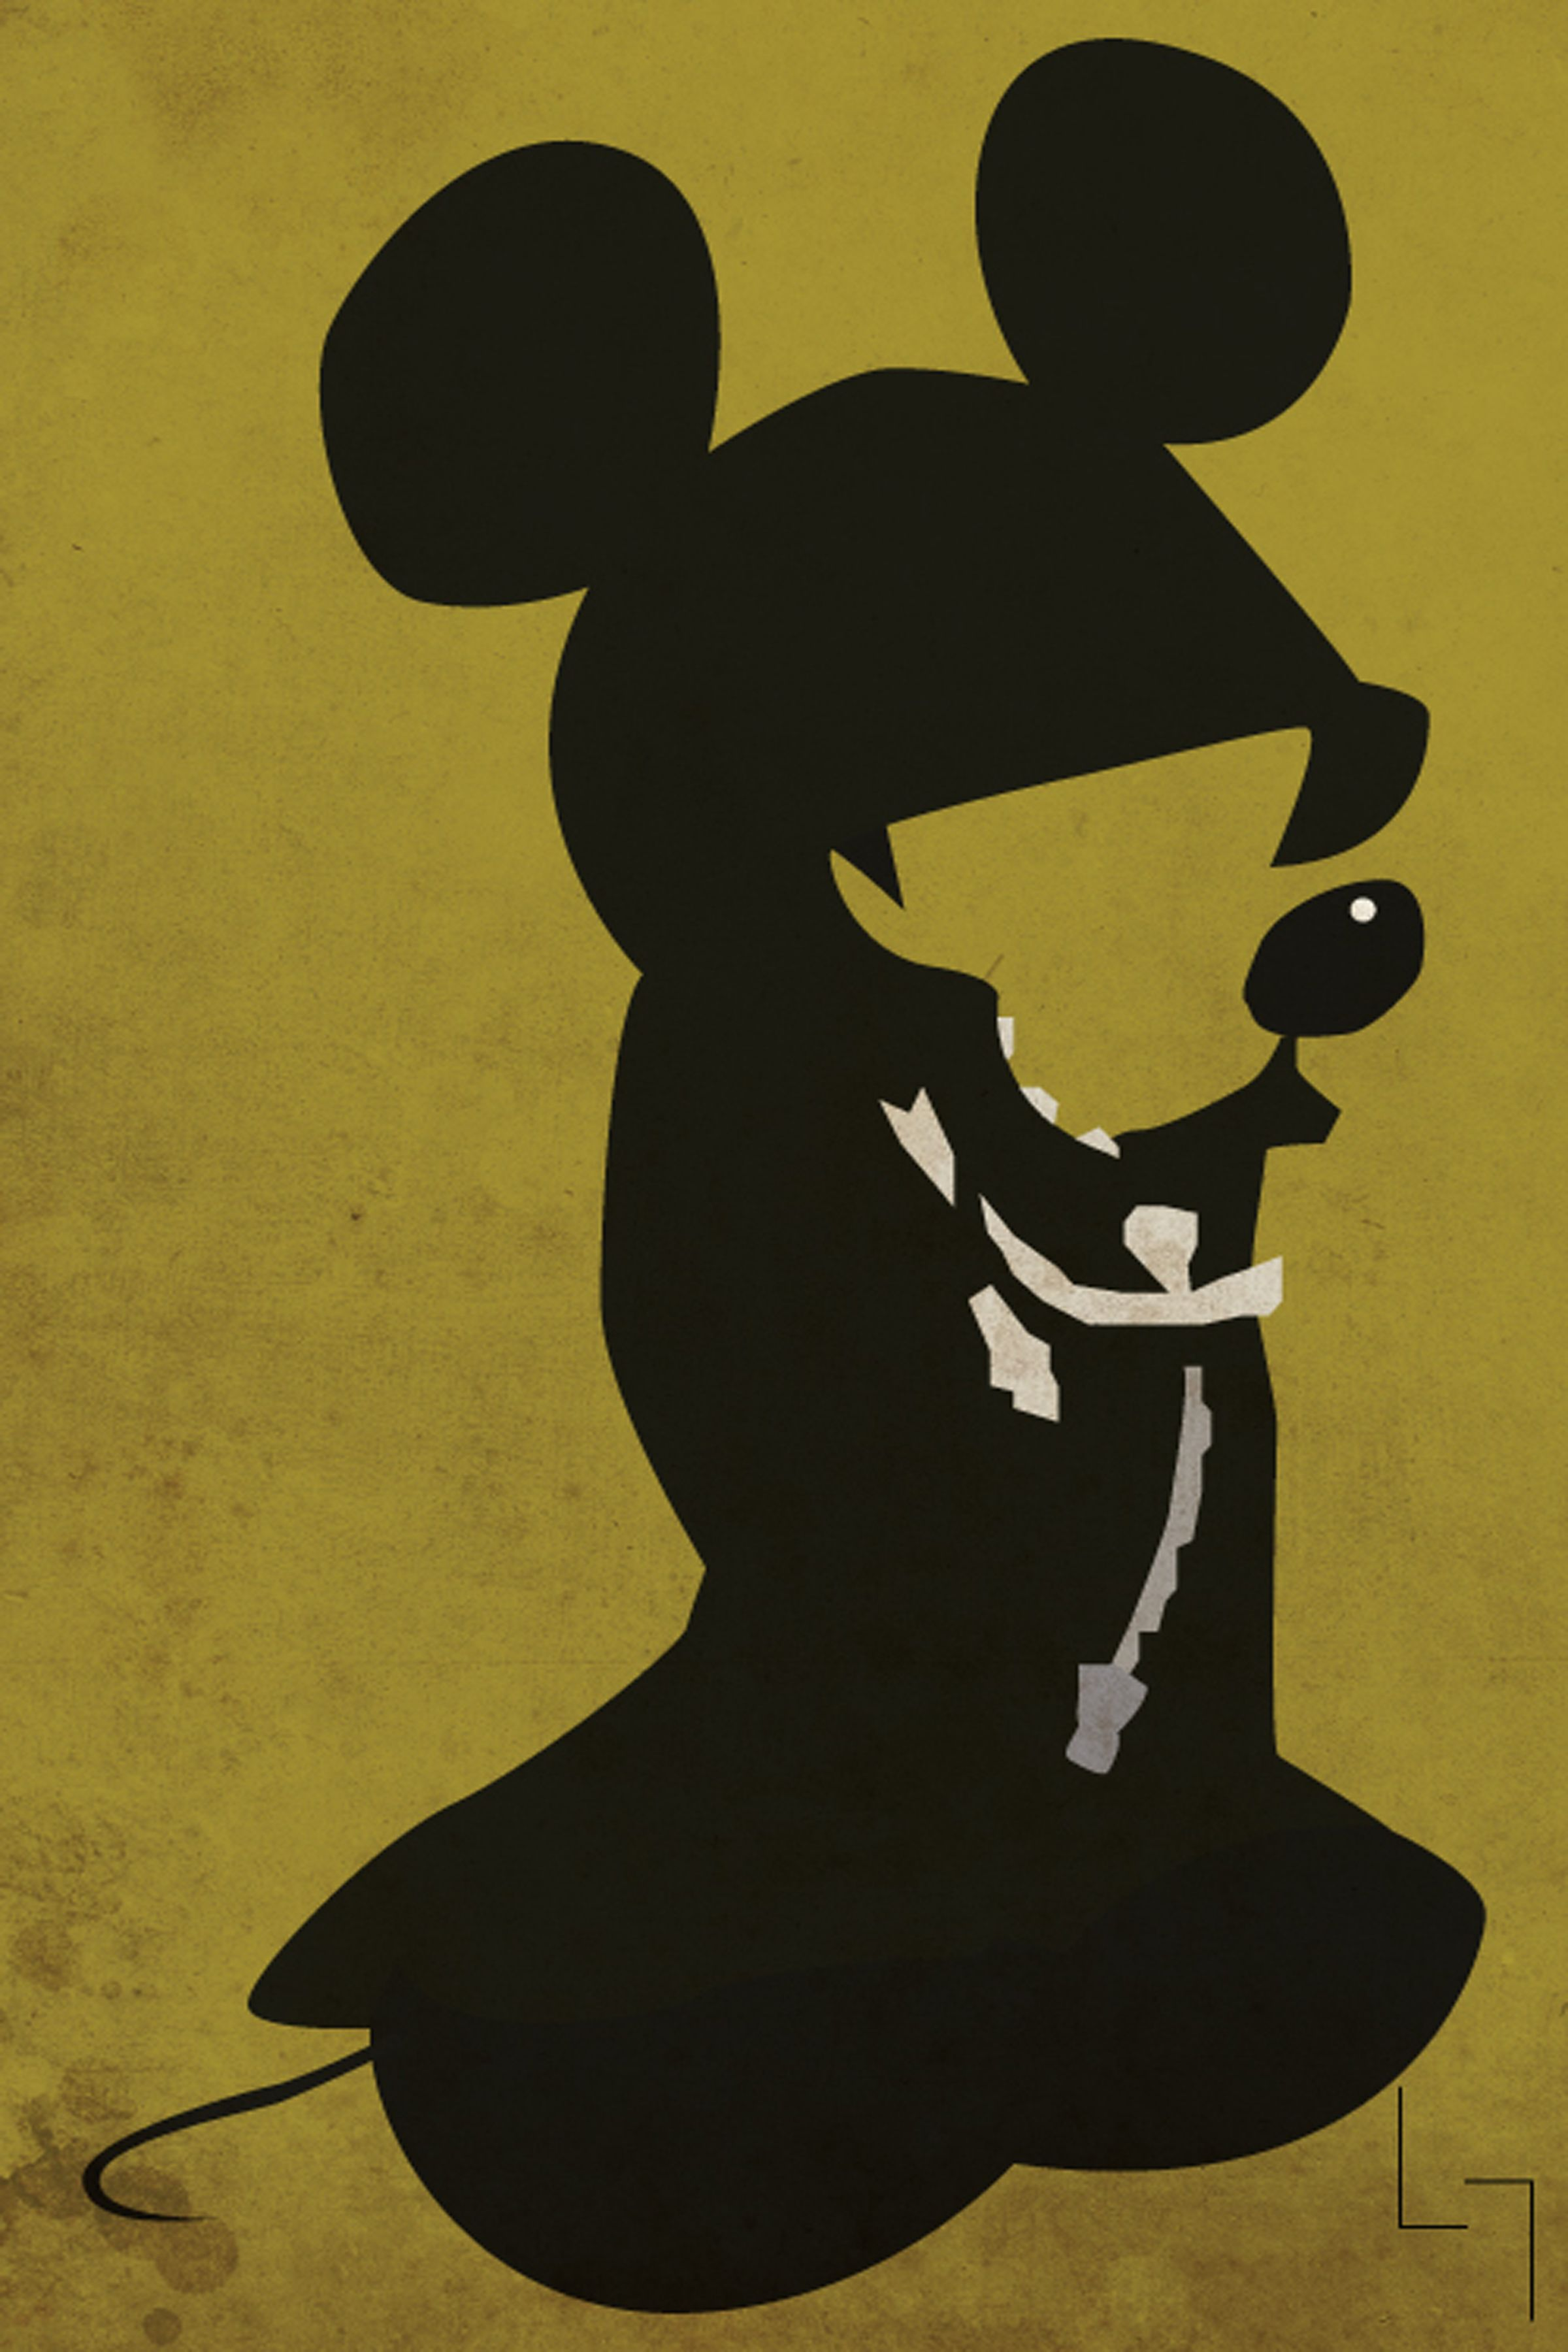 King Mickey Kingdom Hearts Other Disney Pinterest Kingdom